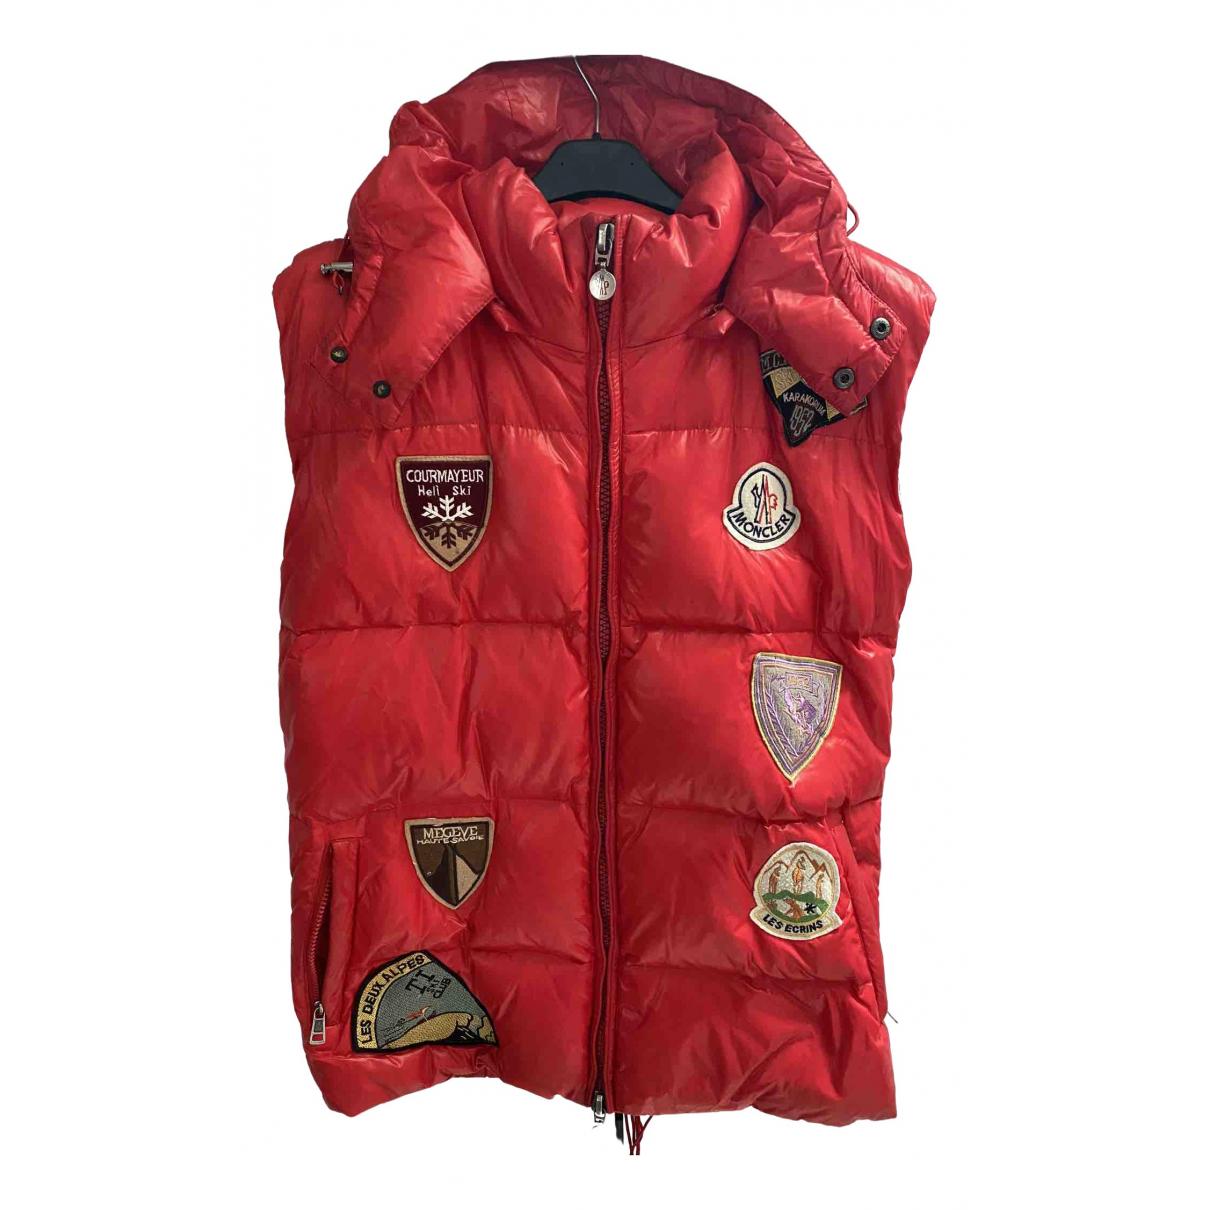 Moncler - Manteau Sleeveless pour homme - rouge